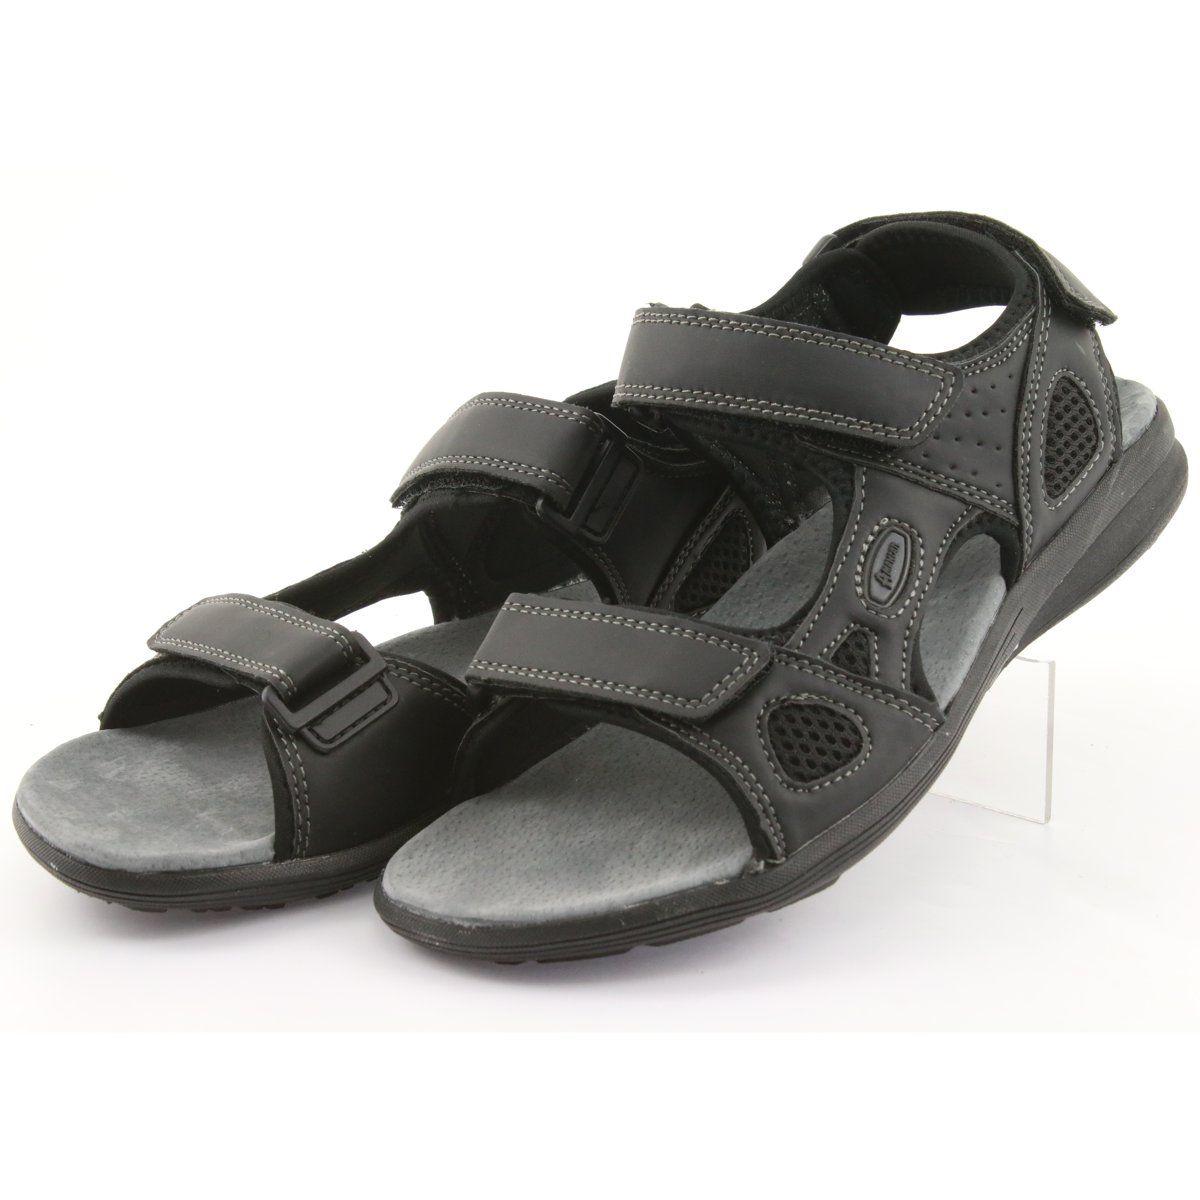 Sandaly Sportowe American Club Hl08 Cz Czarne Sport Sandals Womens Sandals Black Sandals